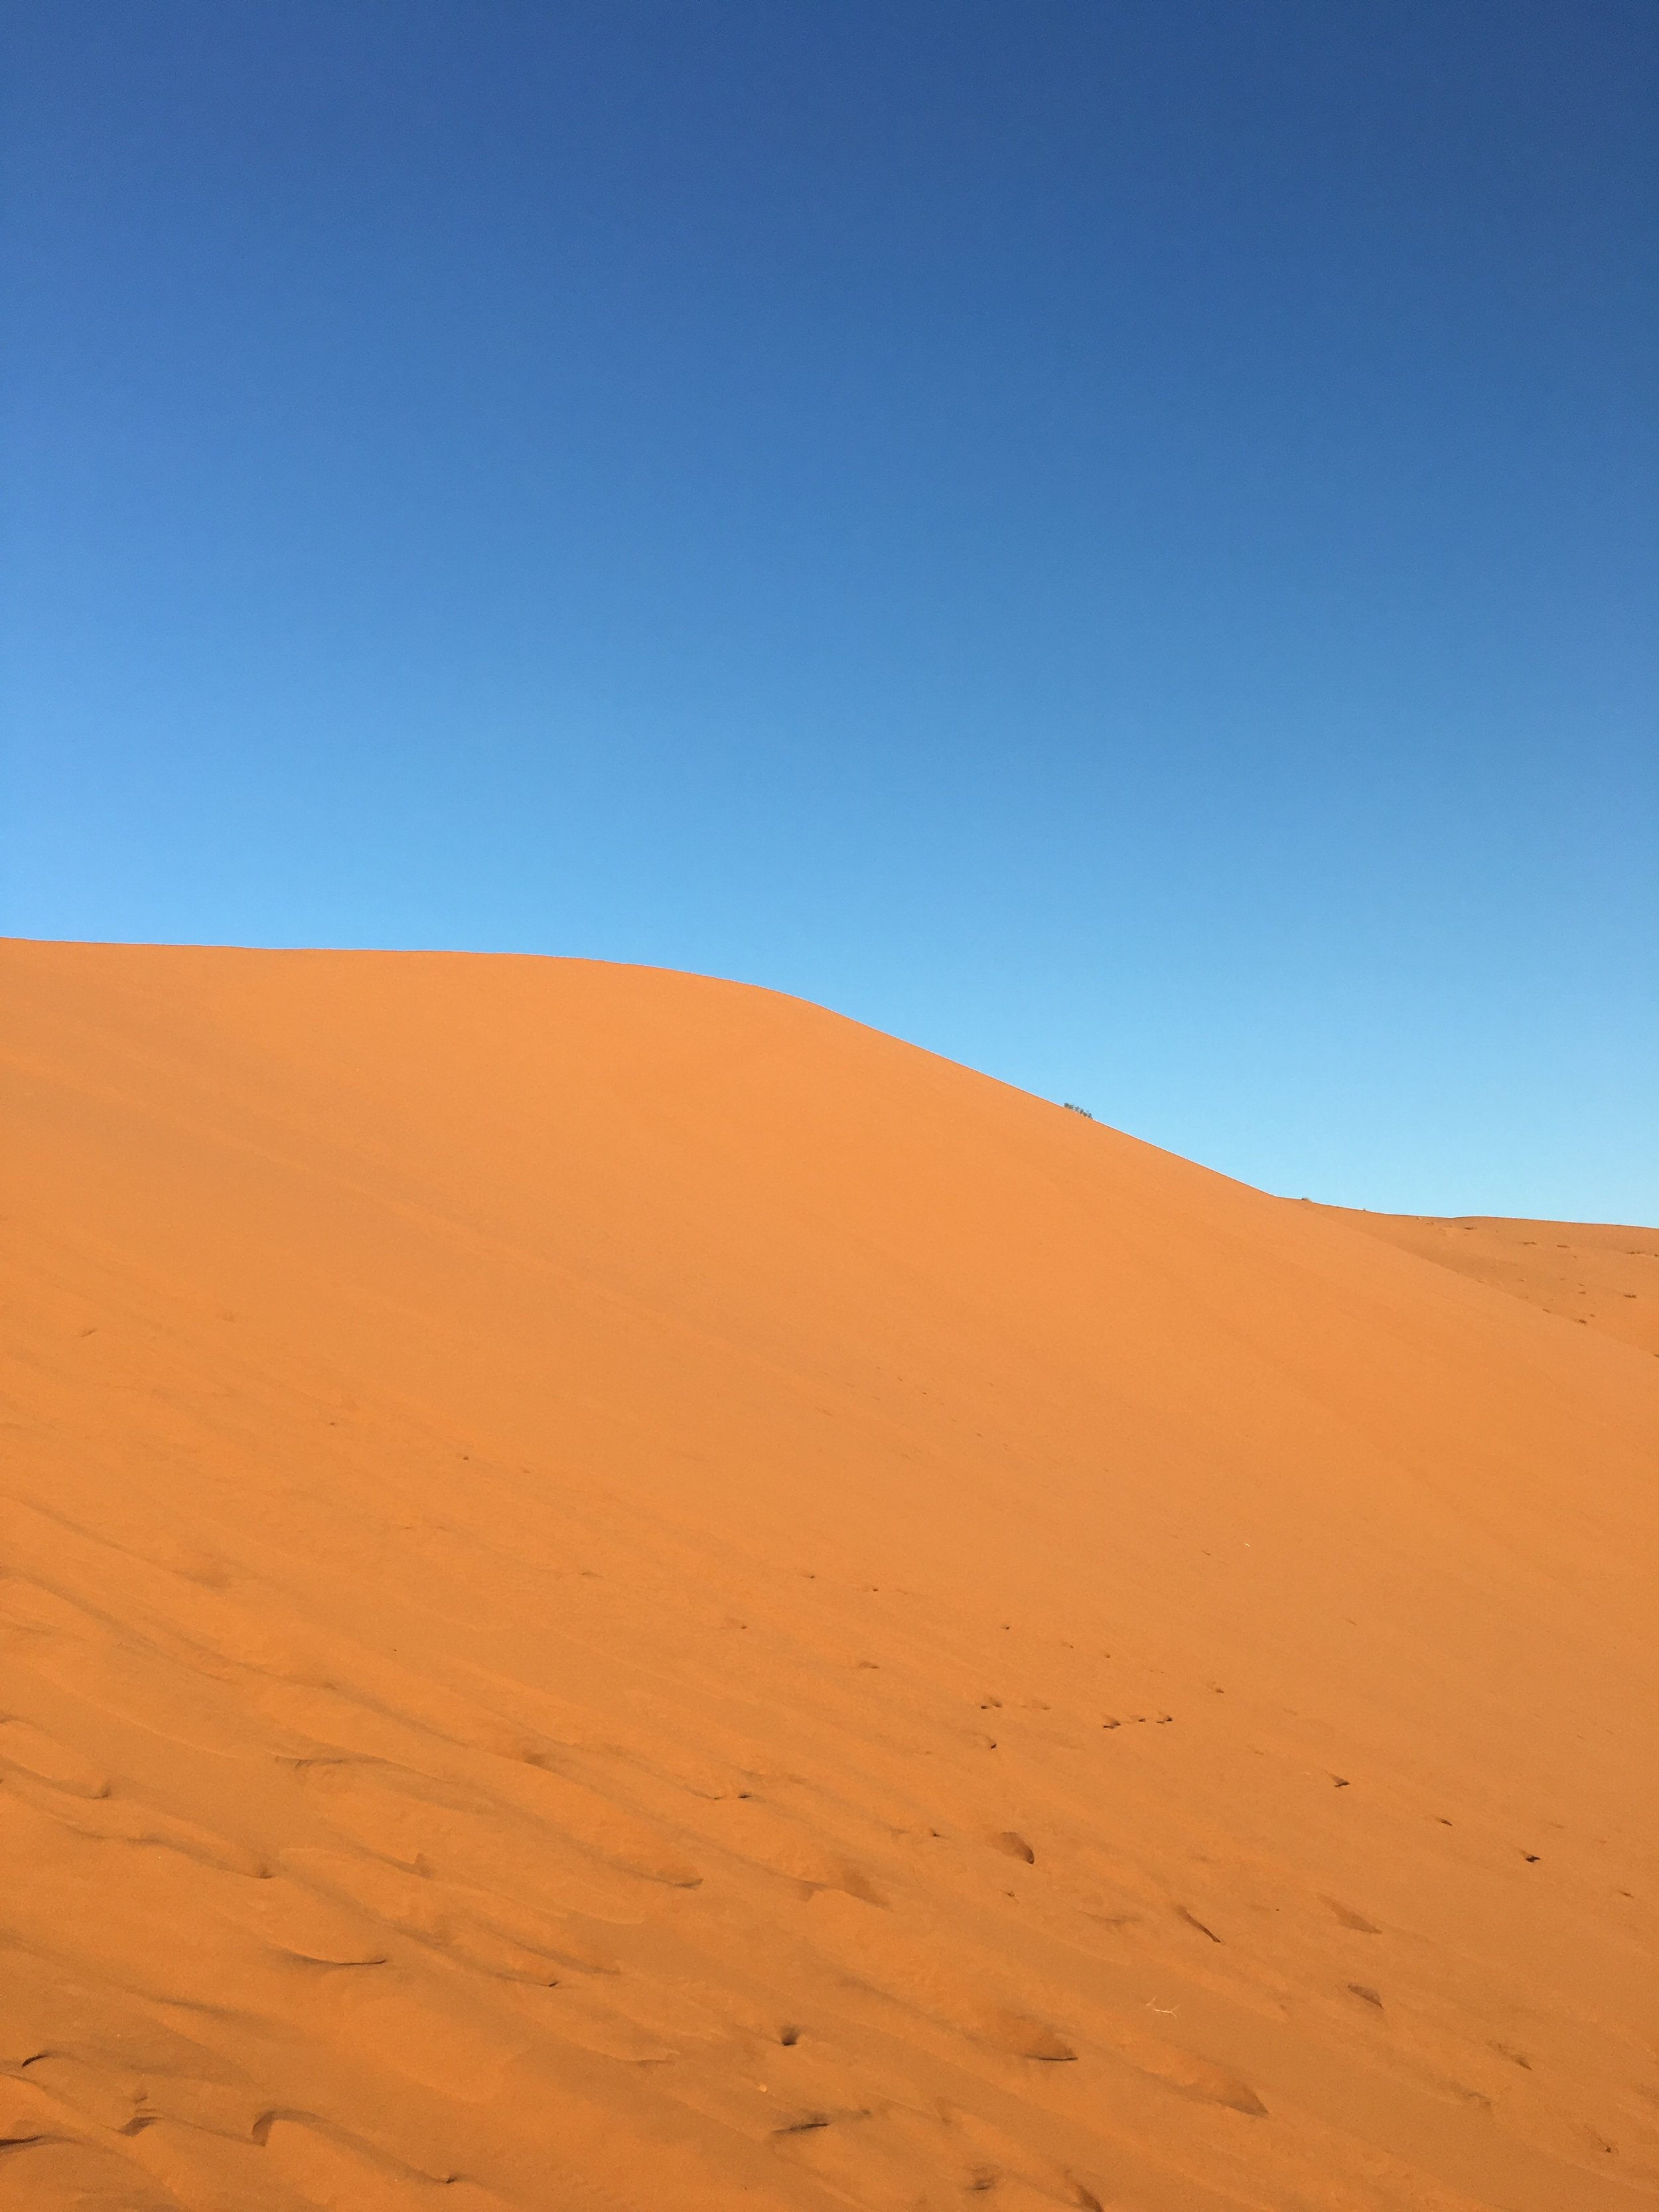 The Sand.